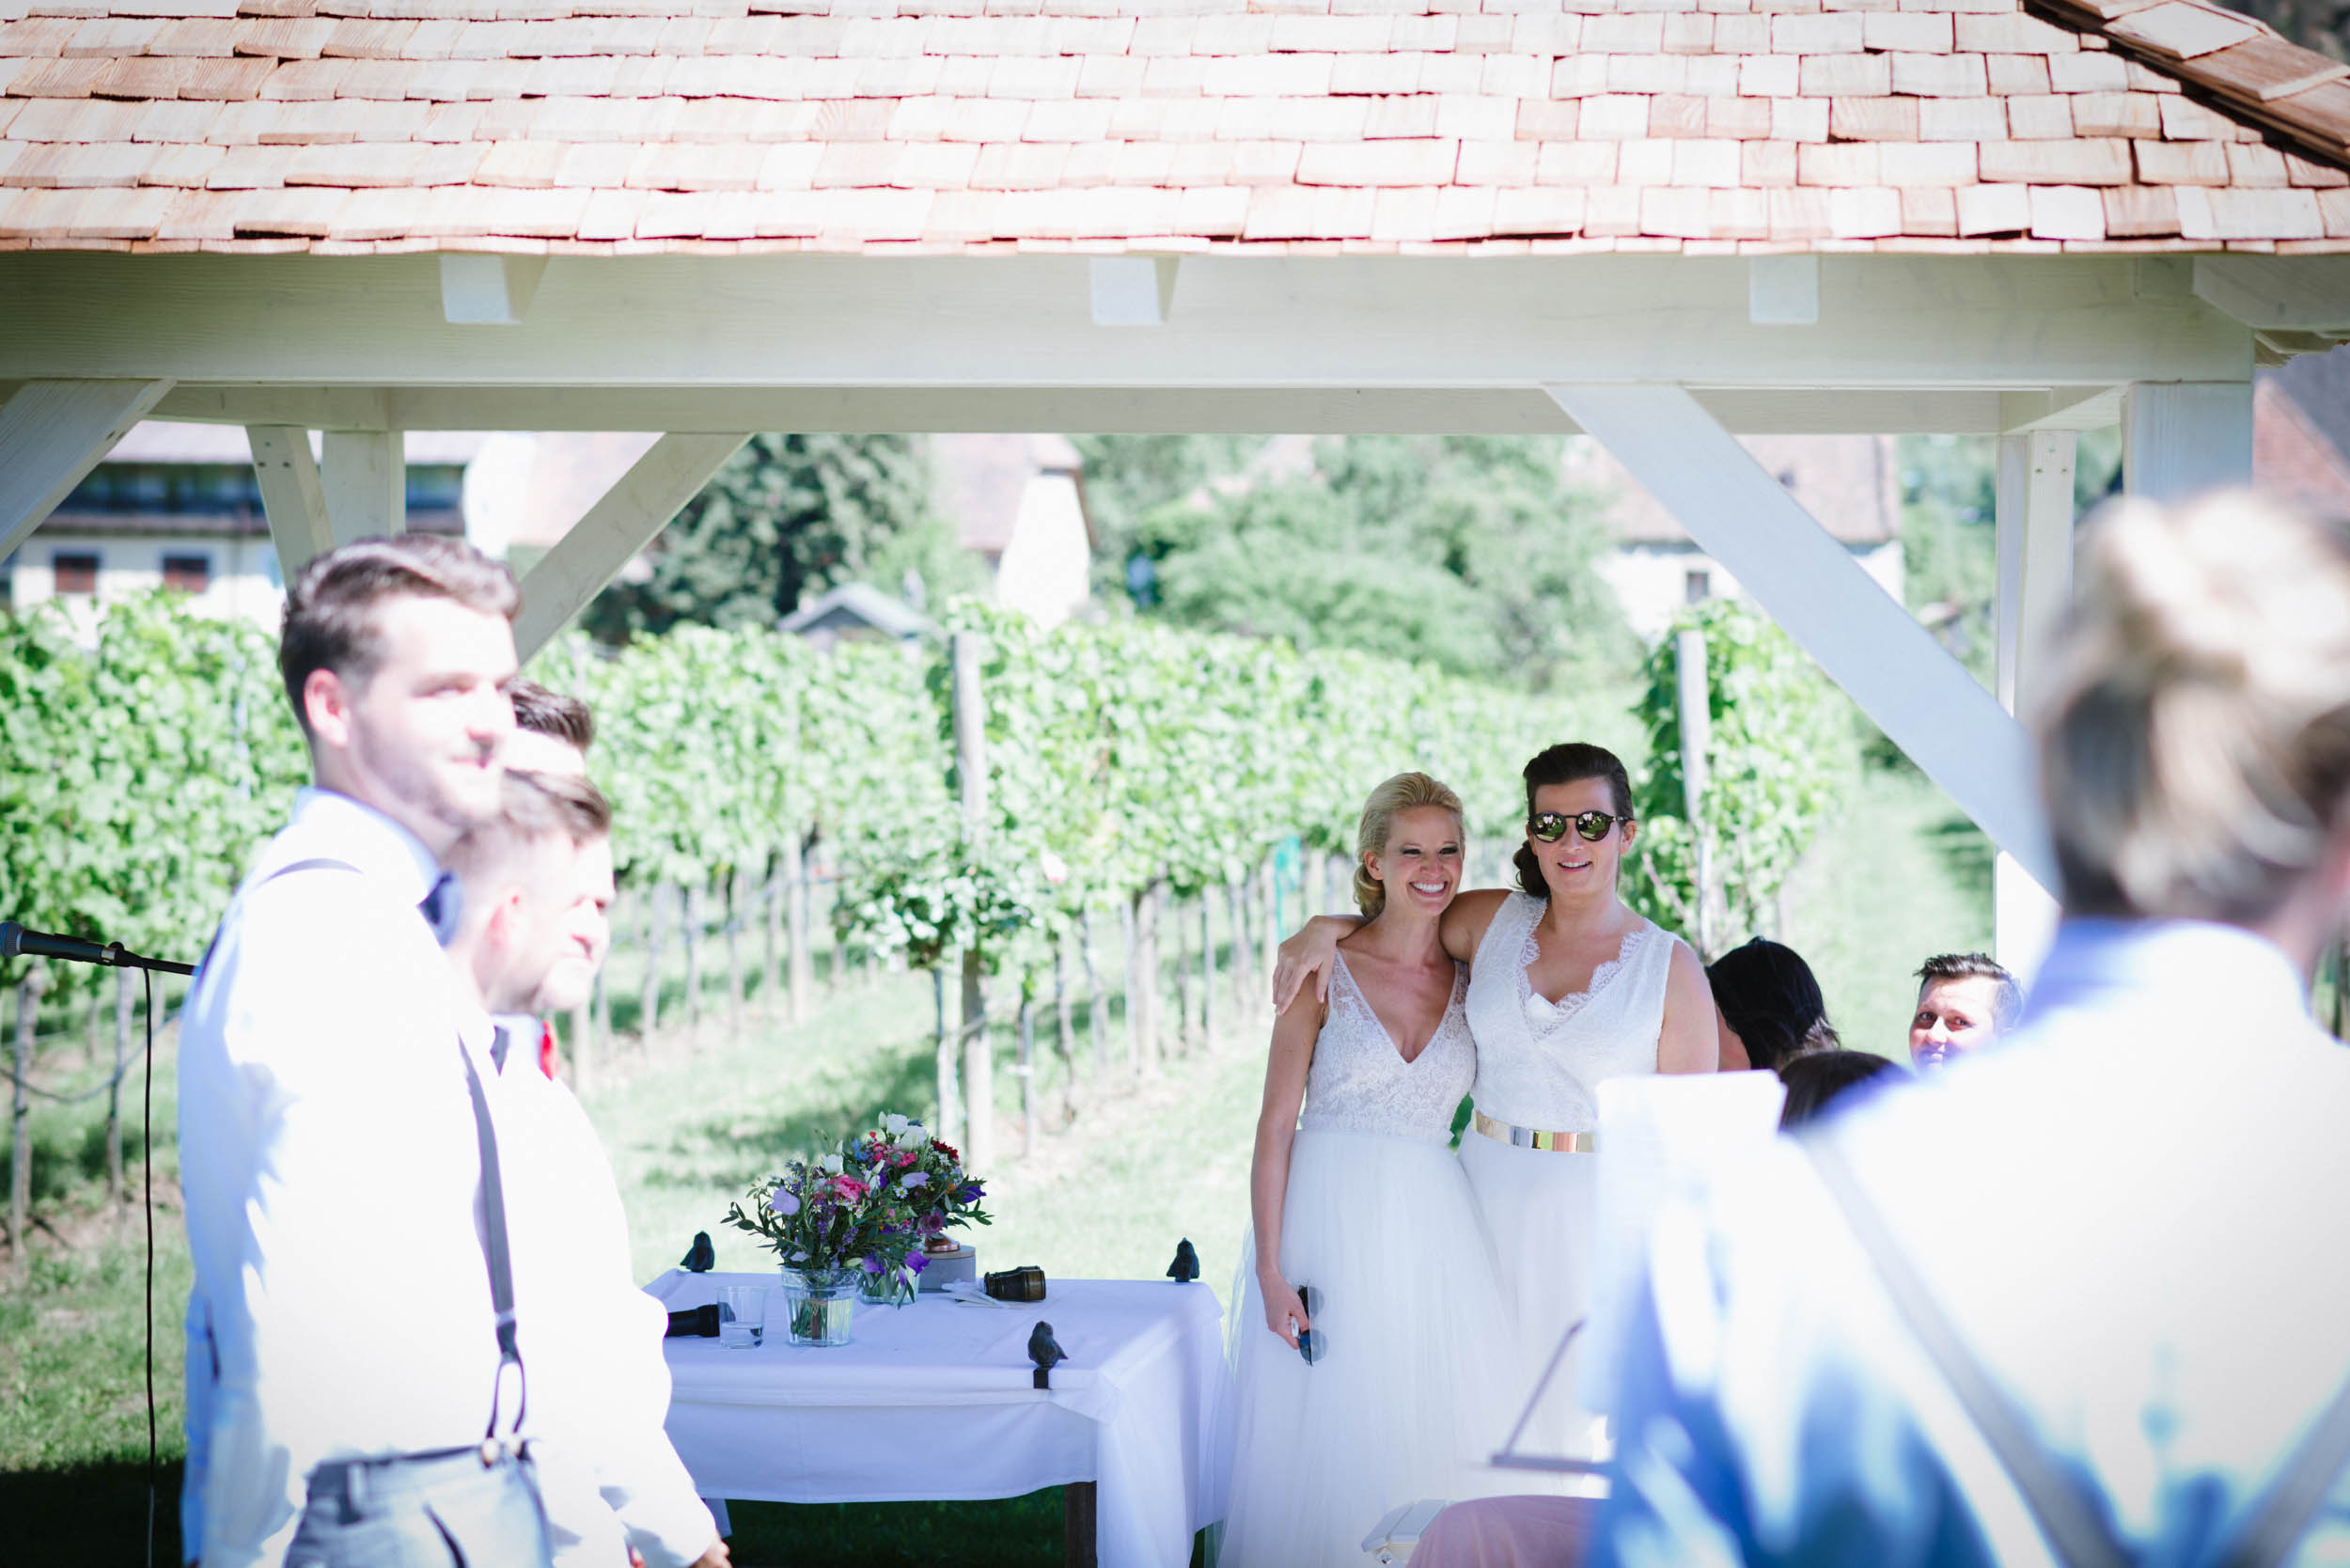 belle&sass__Lesbian Wedding in Austria_0062.jpg